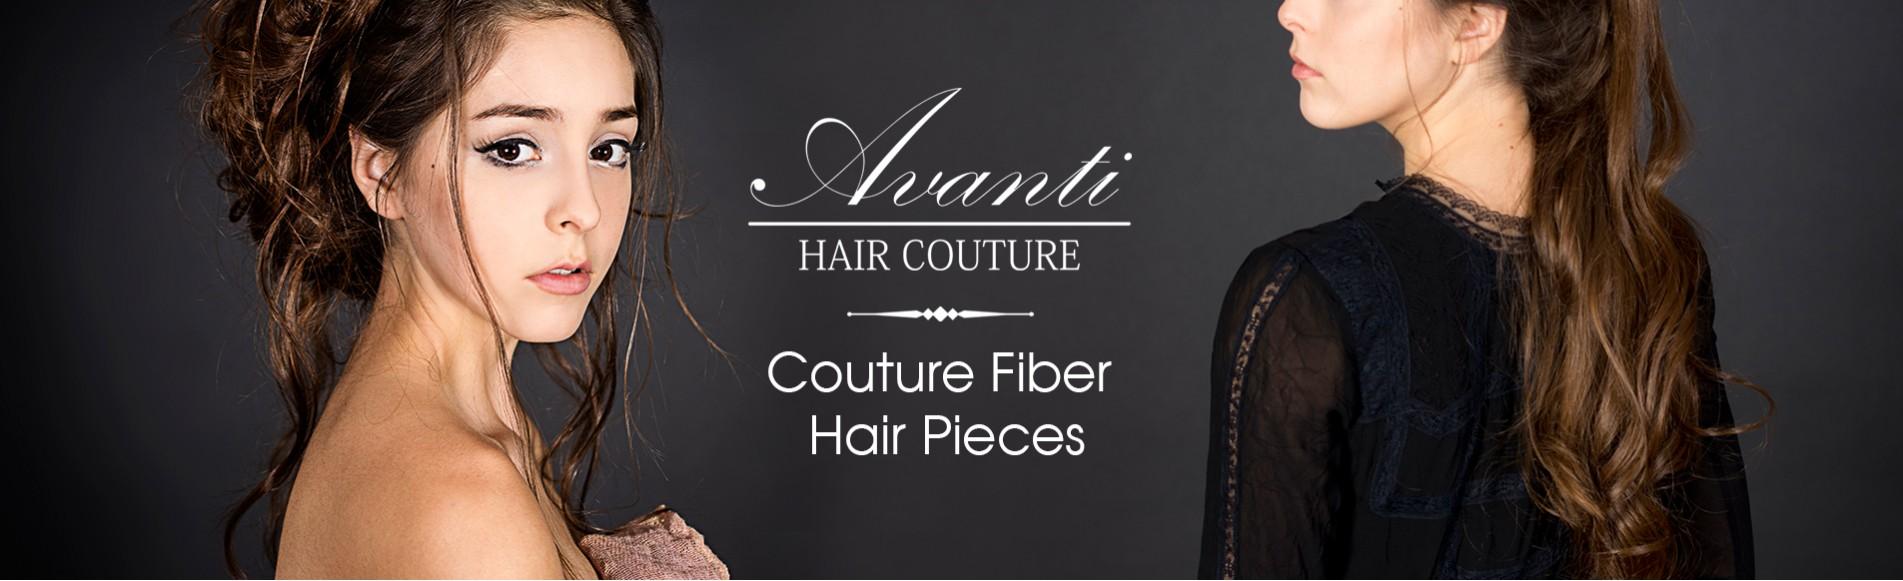 Hair Extensions Avanti